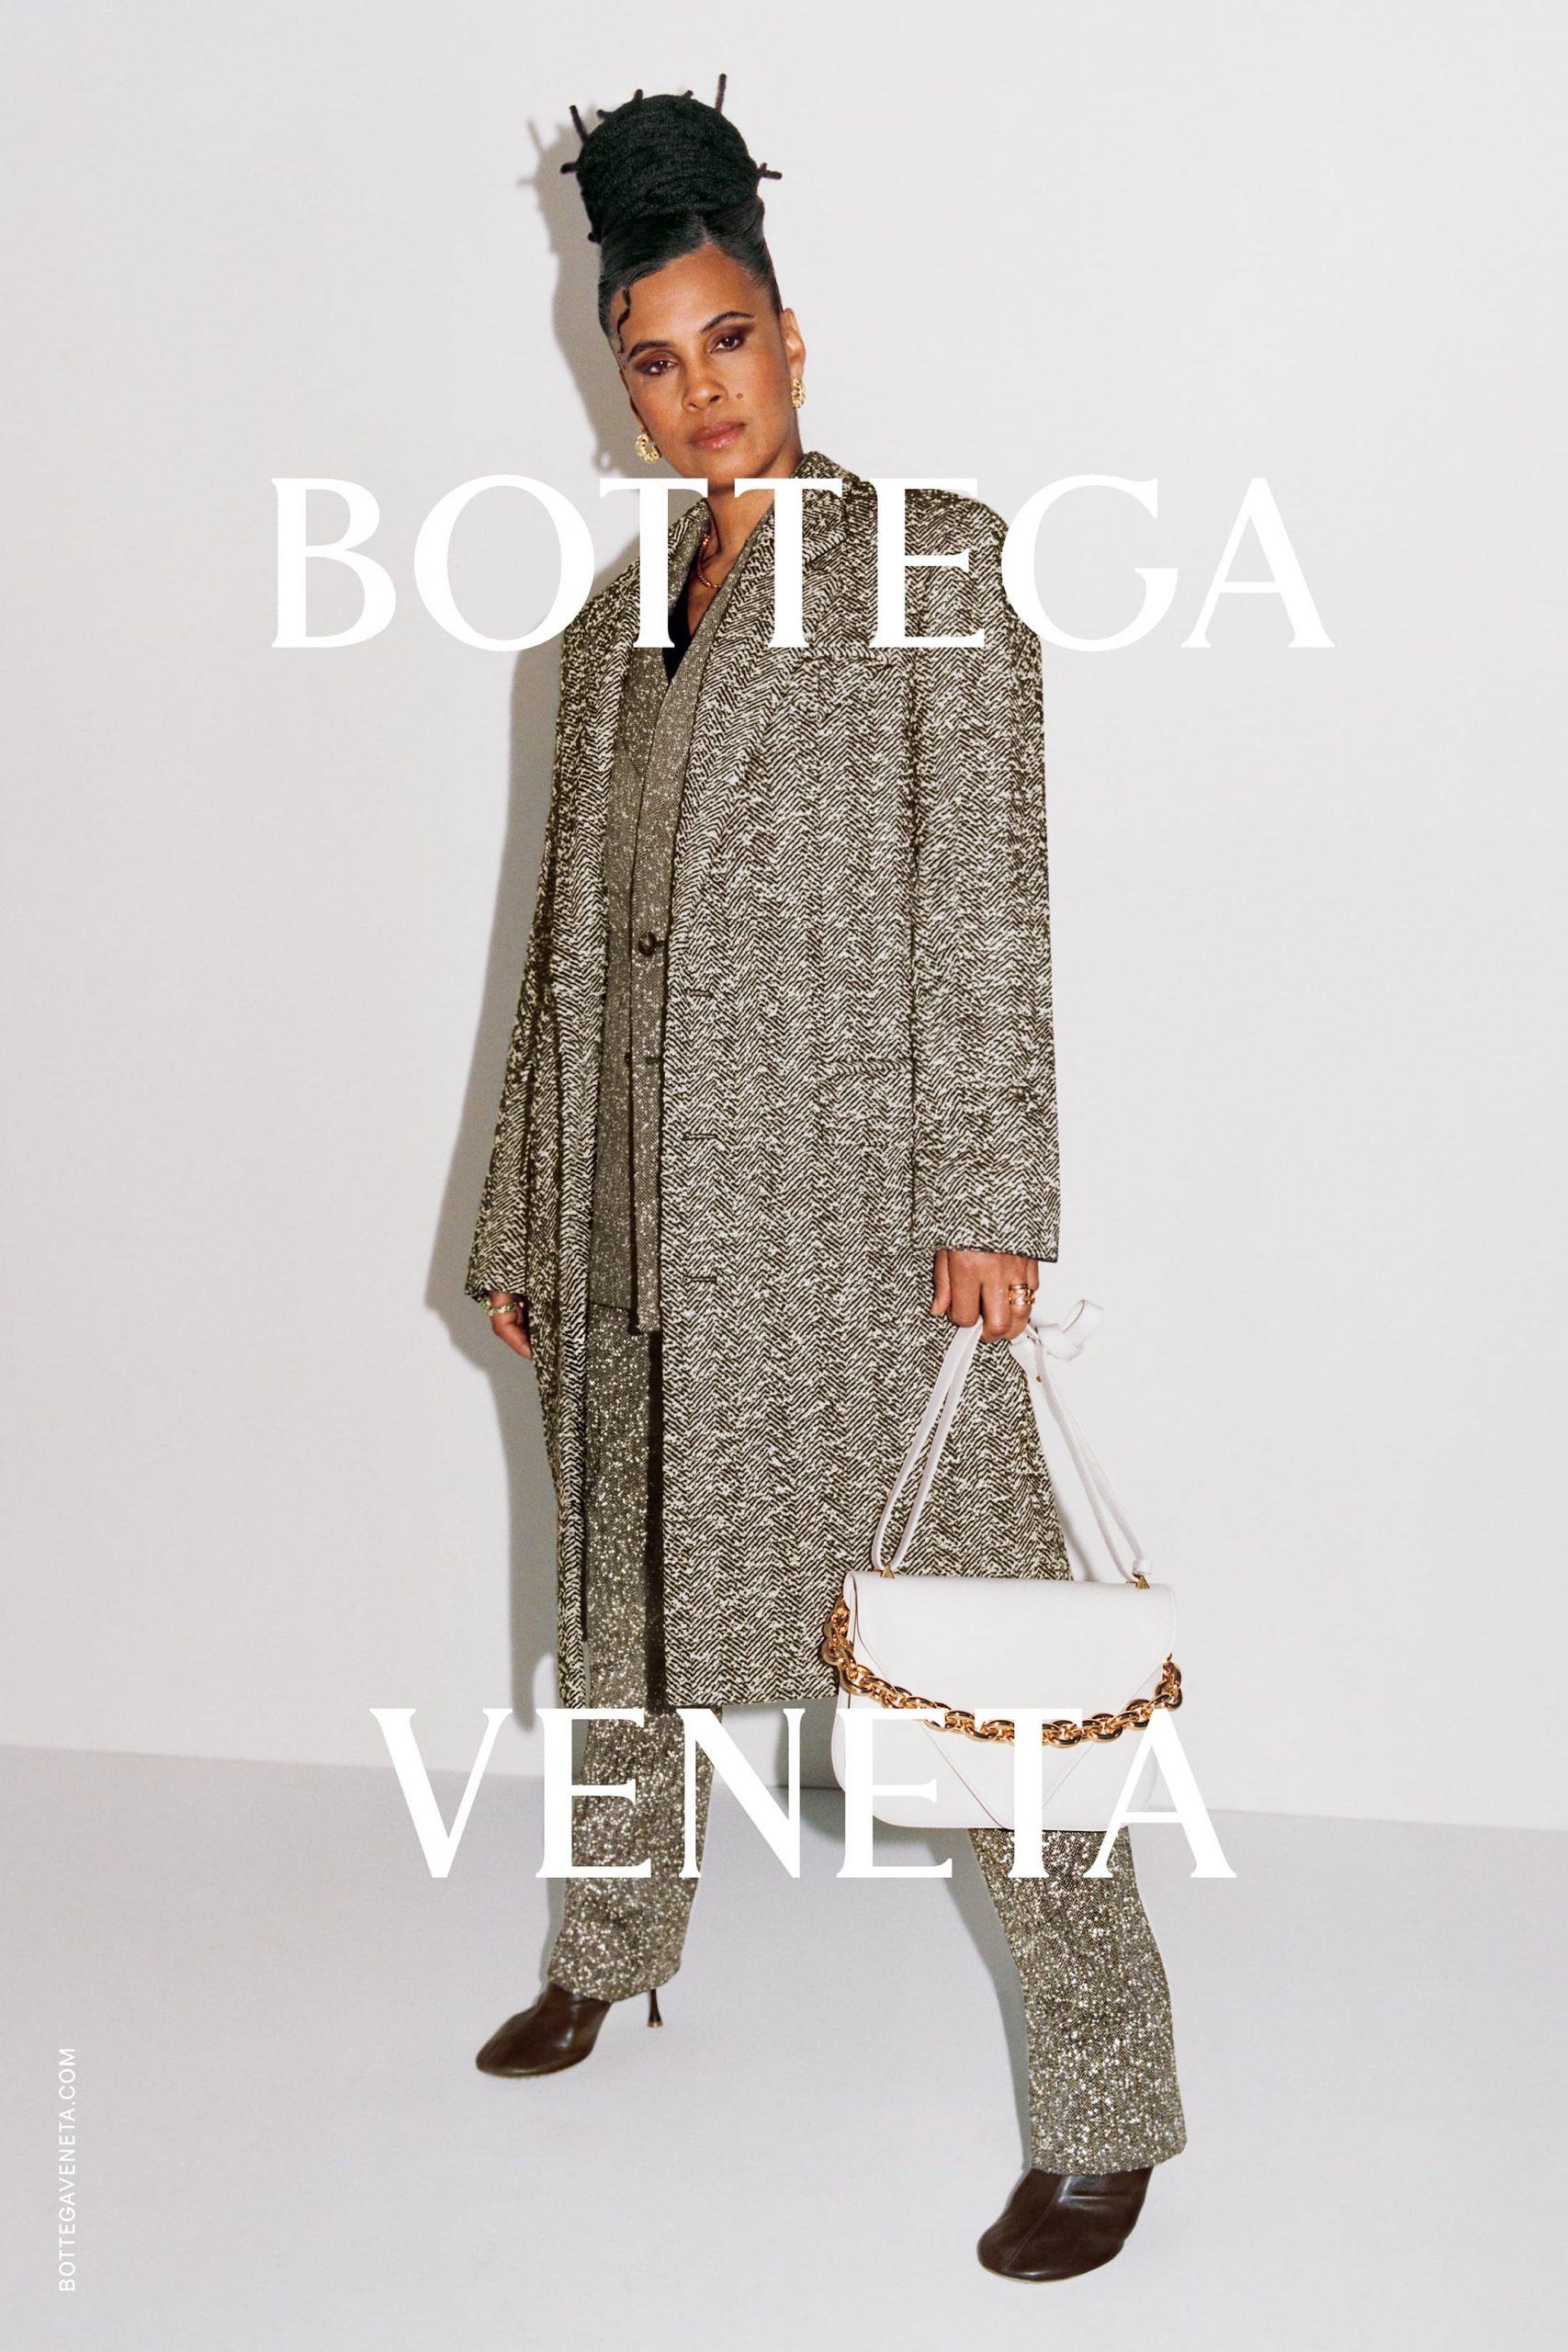 Bottega Veneta Wardrobe 02 Pre-Fall 2021 Ad Campaign Photos